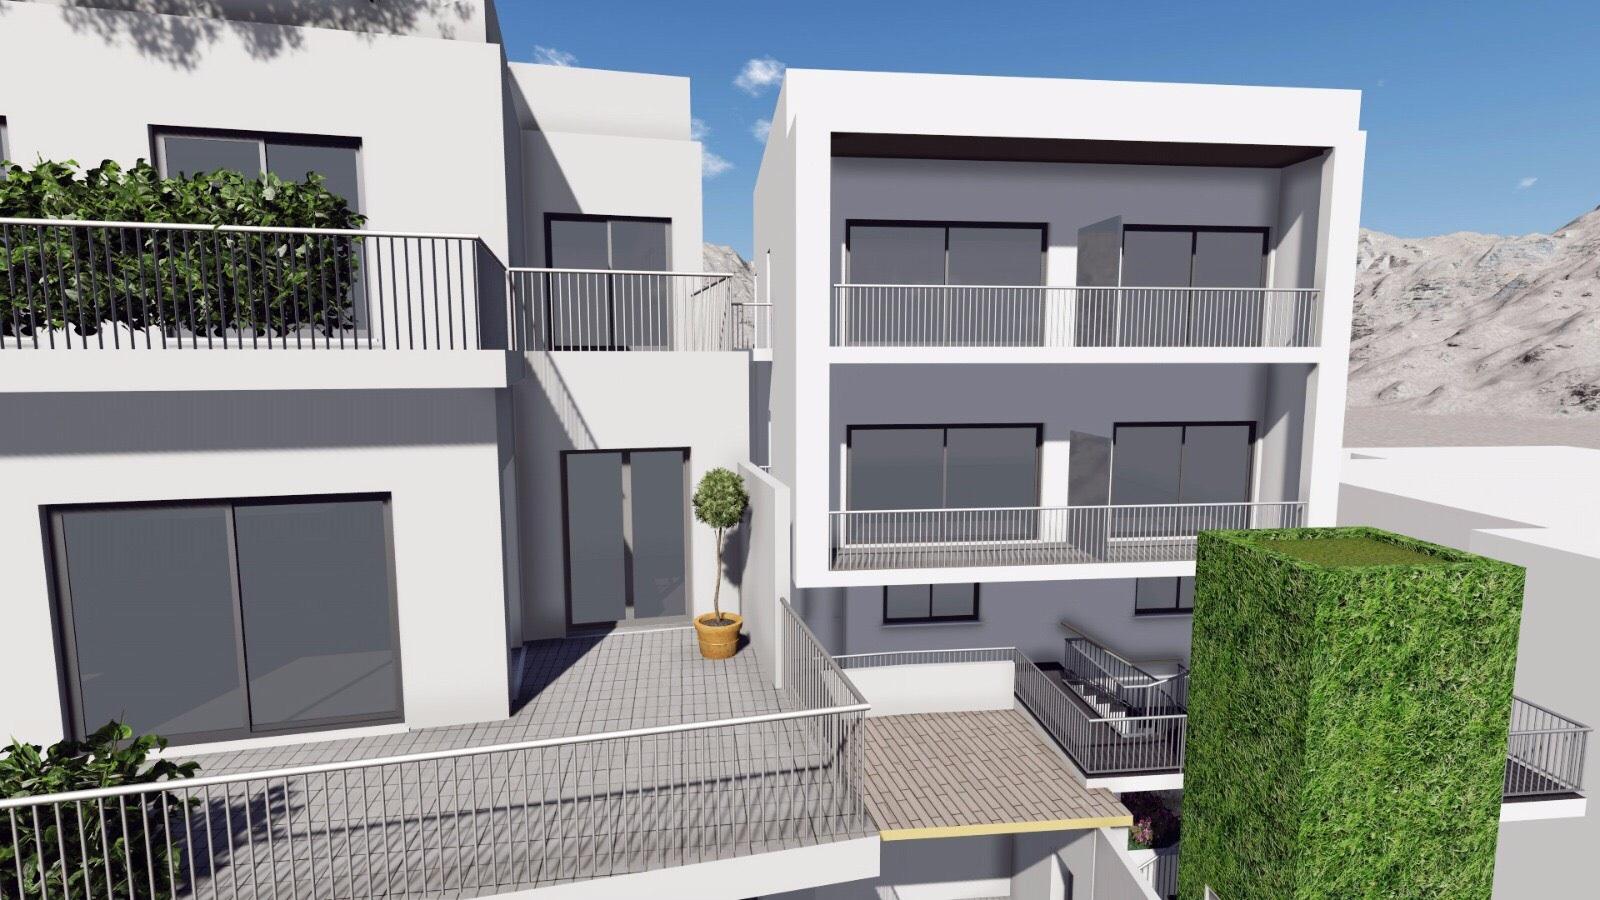 Balcon fenetre de toit velux cabrio gdl verrire balcon for Fenetre de toit balcon